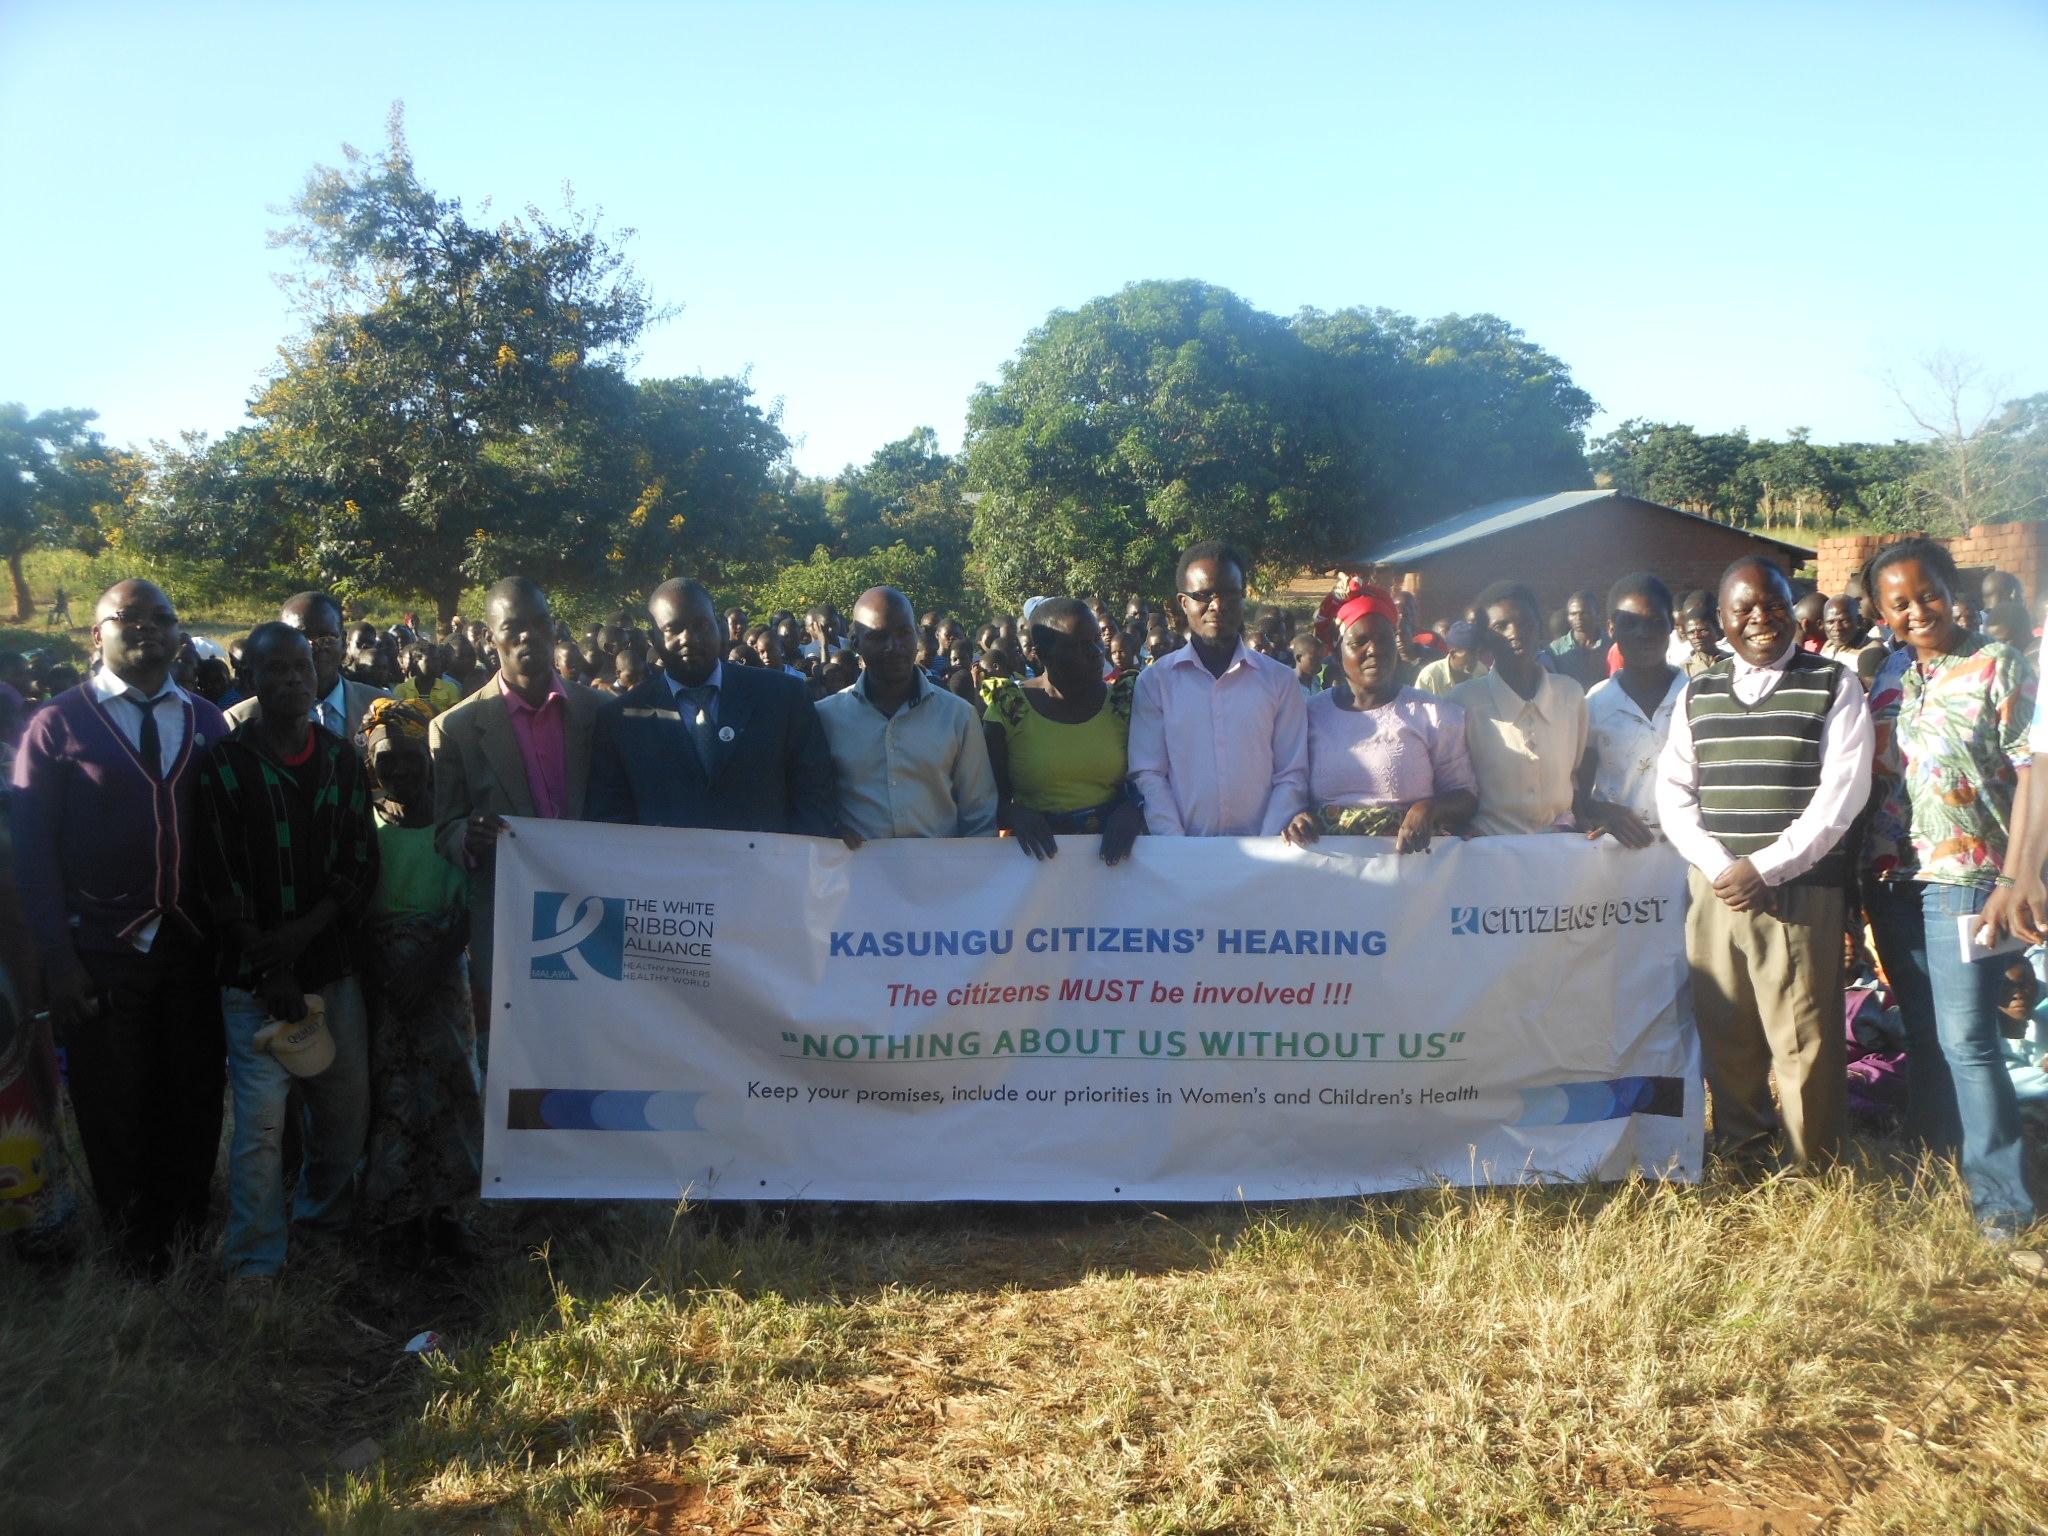 Kasungu Hearing with banner_Malawi.JPG